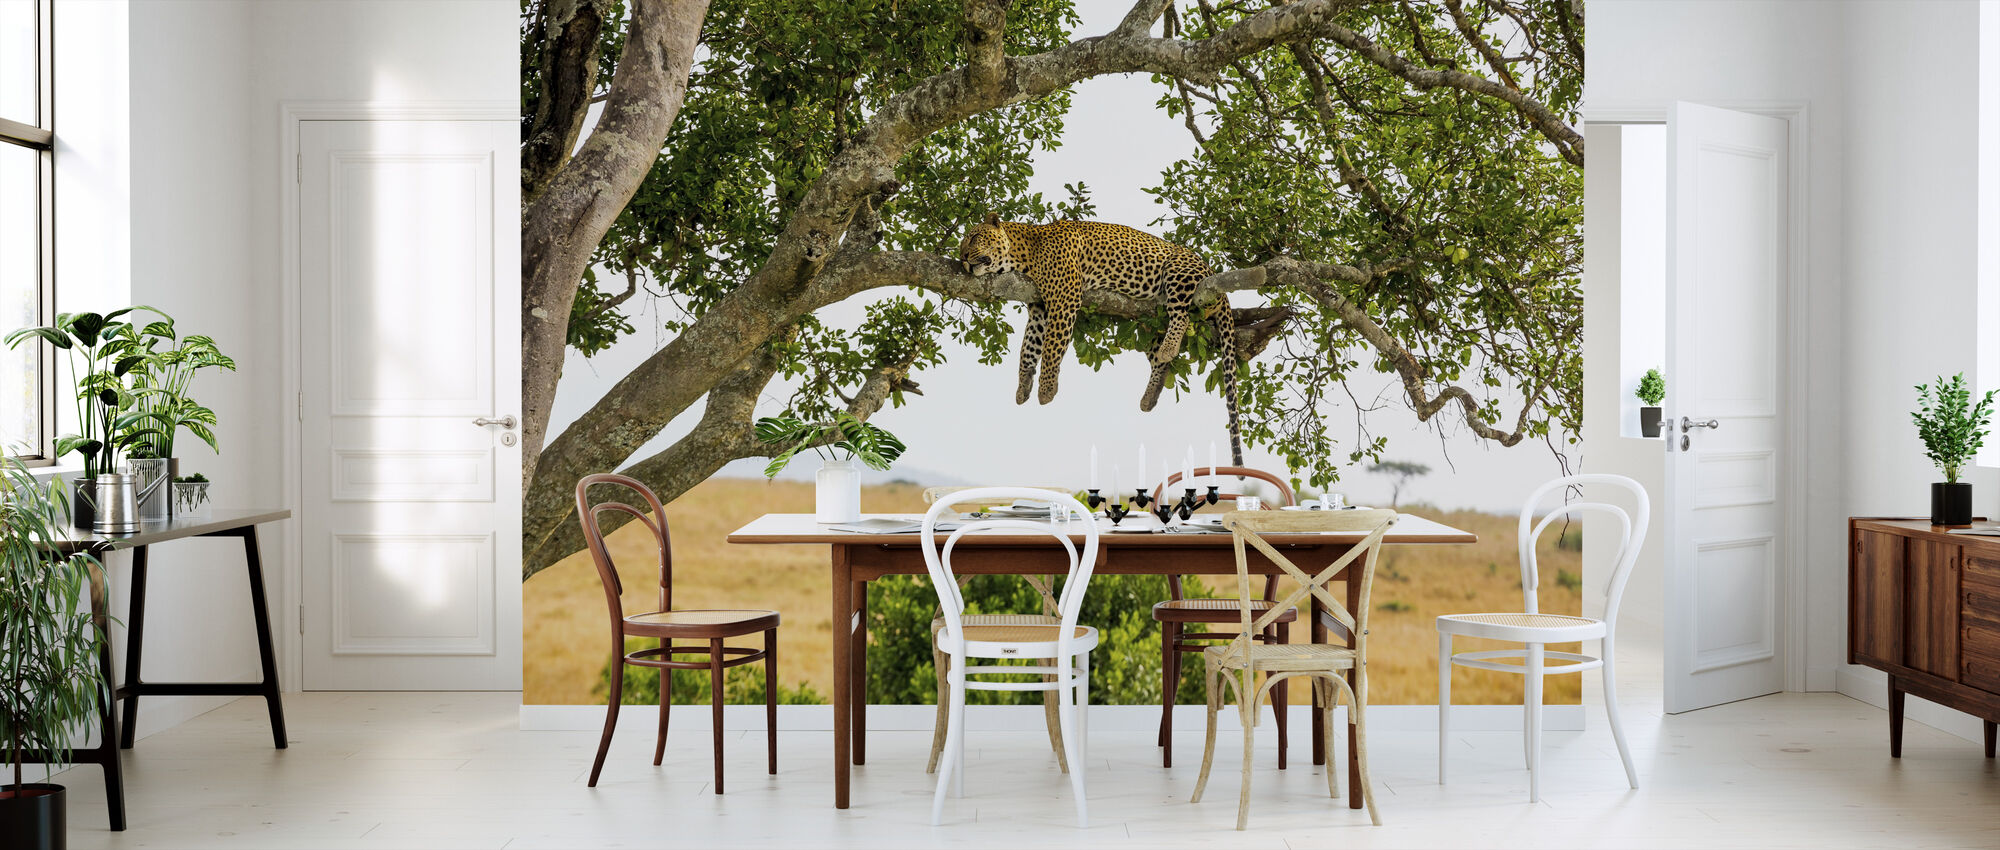 Leopardi nukkuu puussa - Tapetti - Keittiö